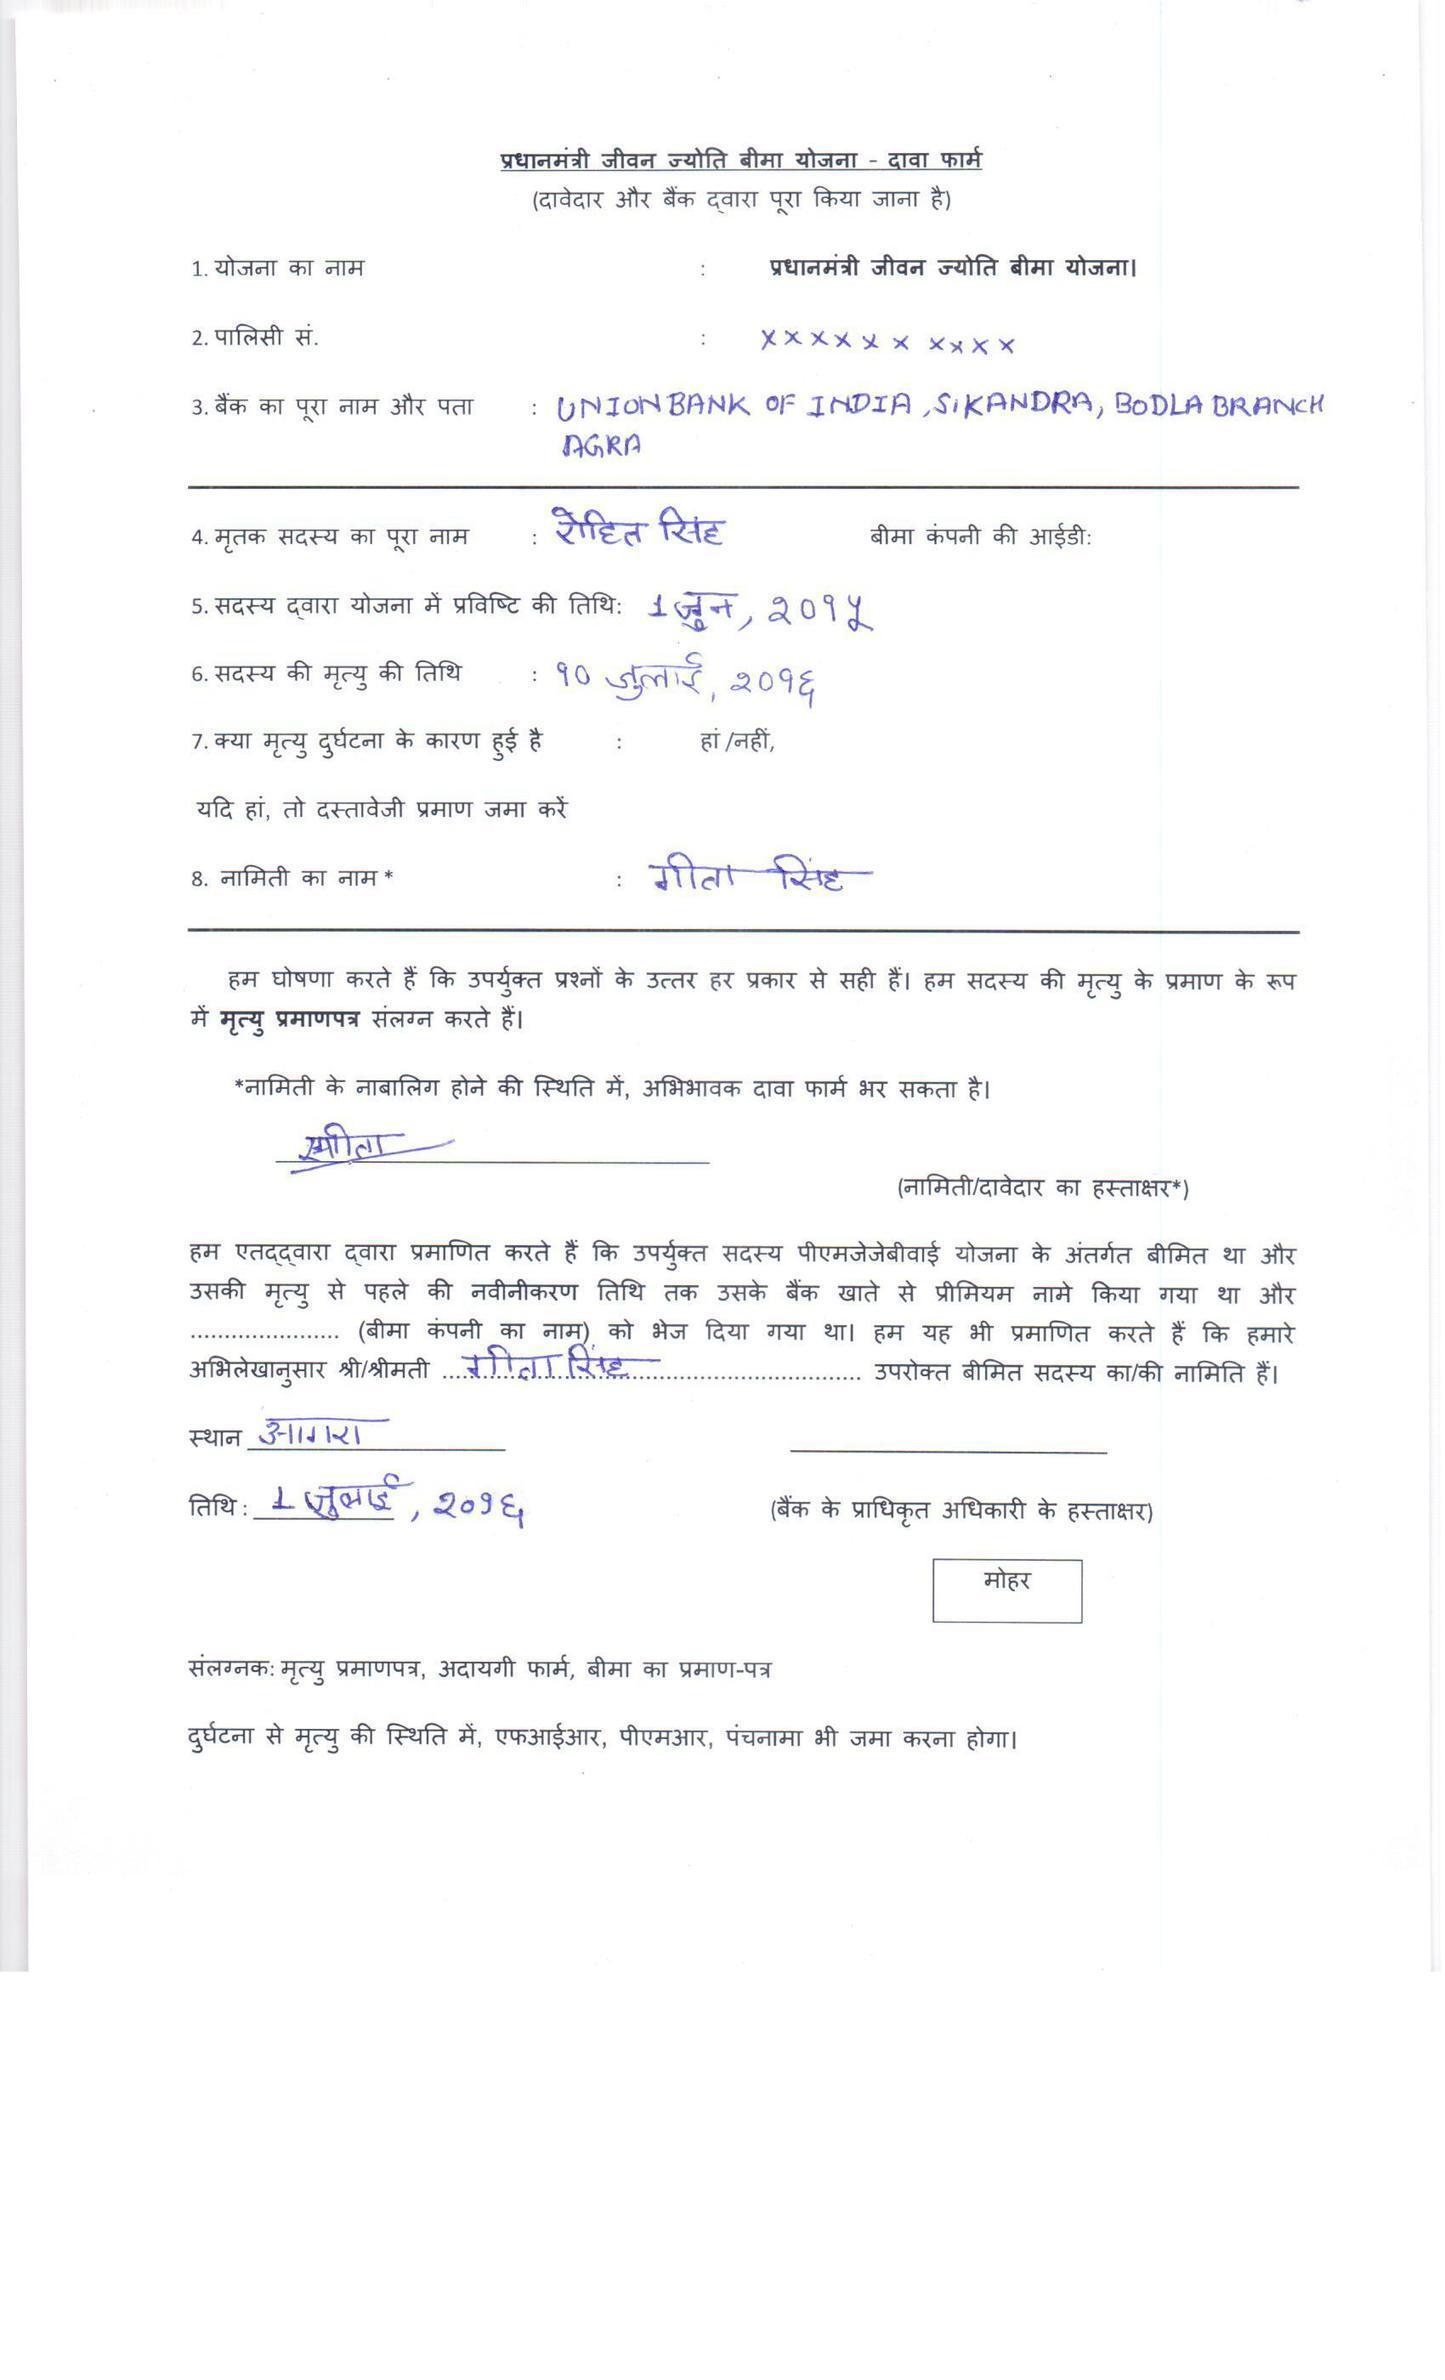 Pradhan mantri jeevan jyoti bima yojana how to